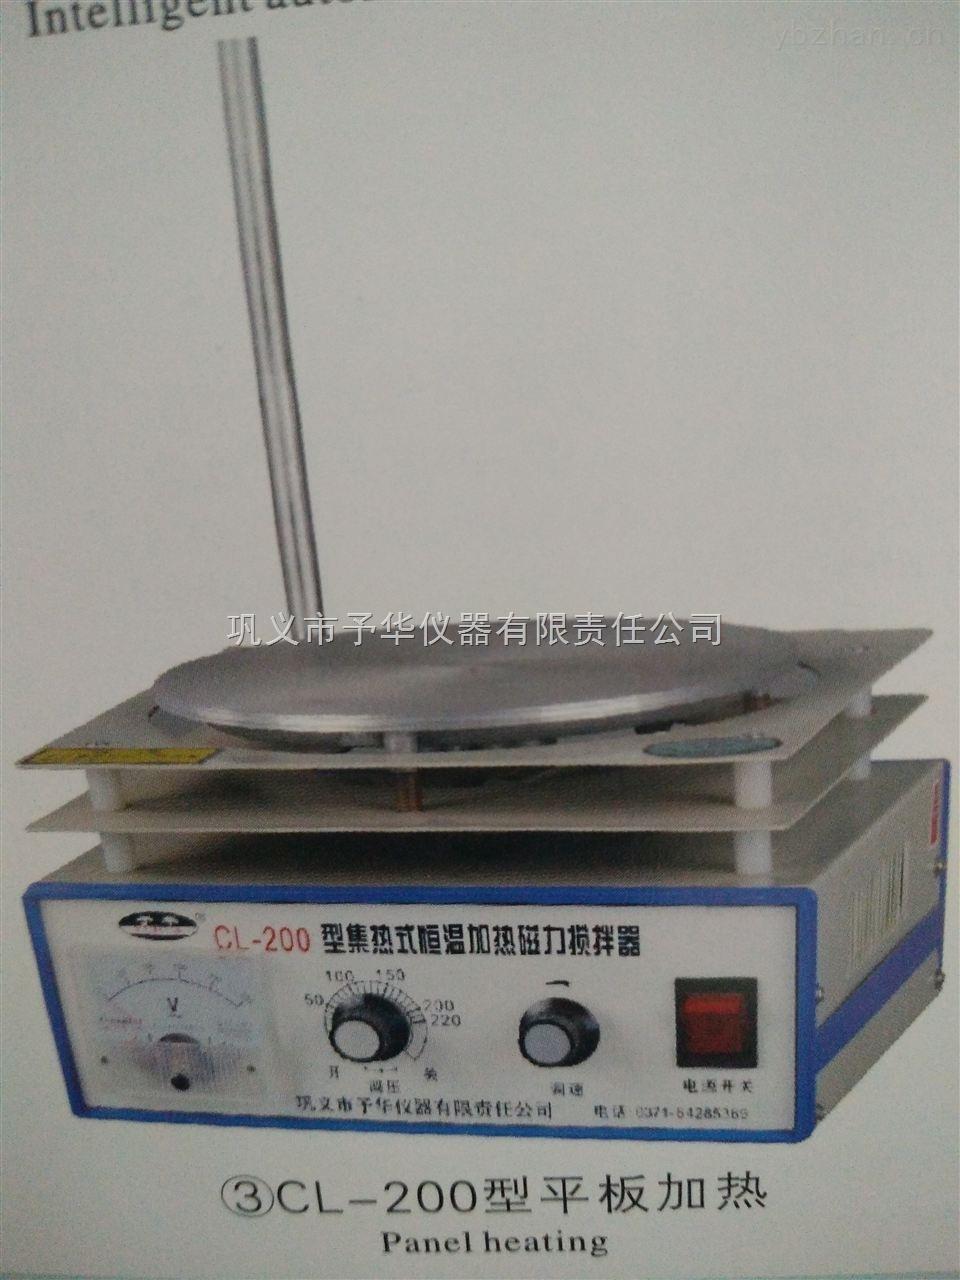 CL-200-新型加熱磁力攪拌器現貨供應